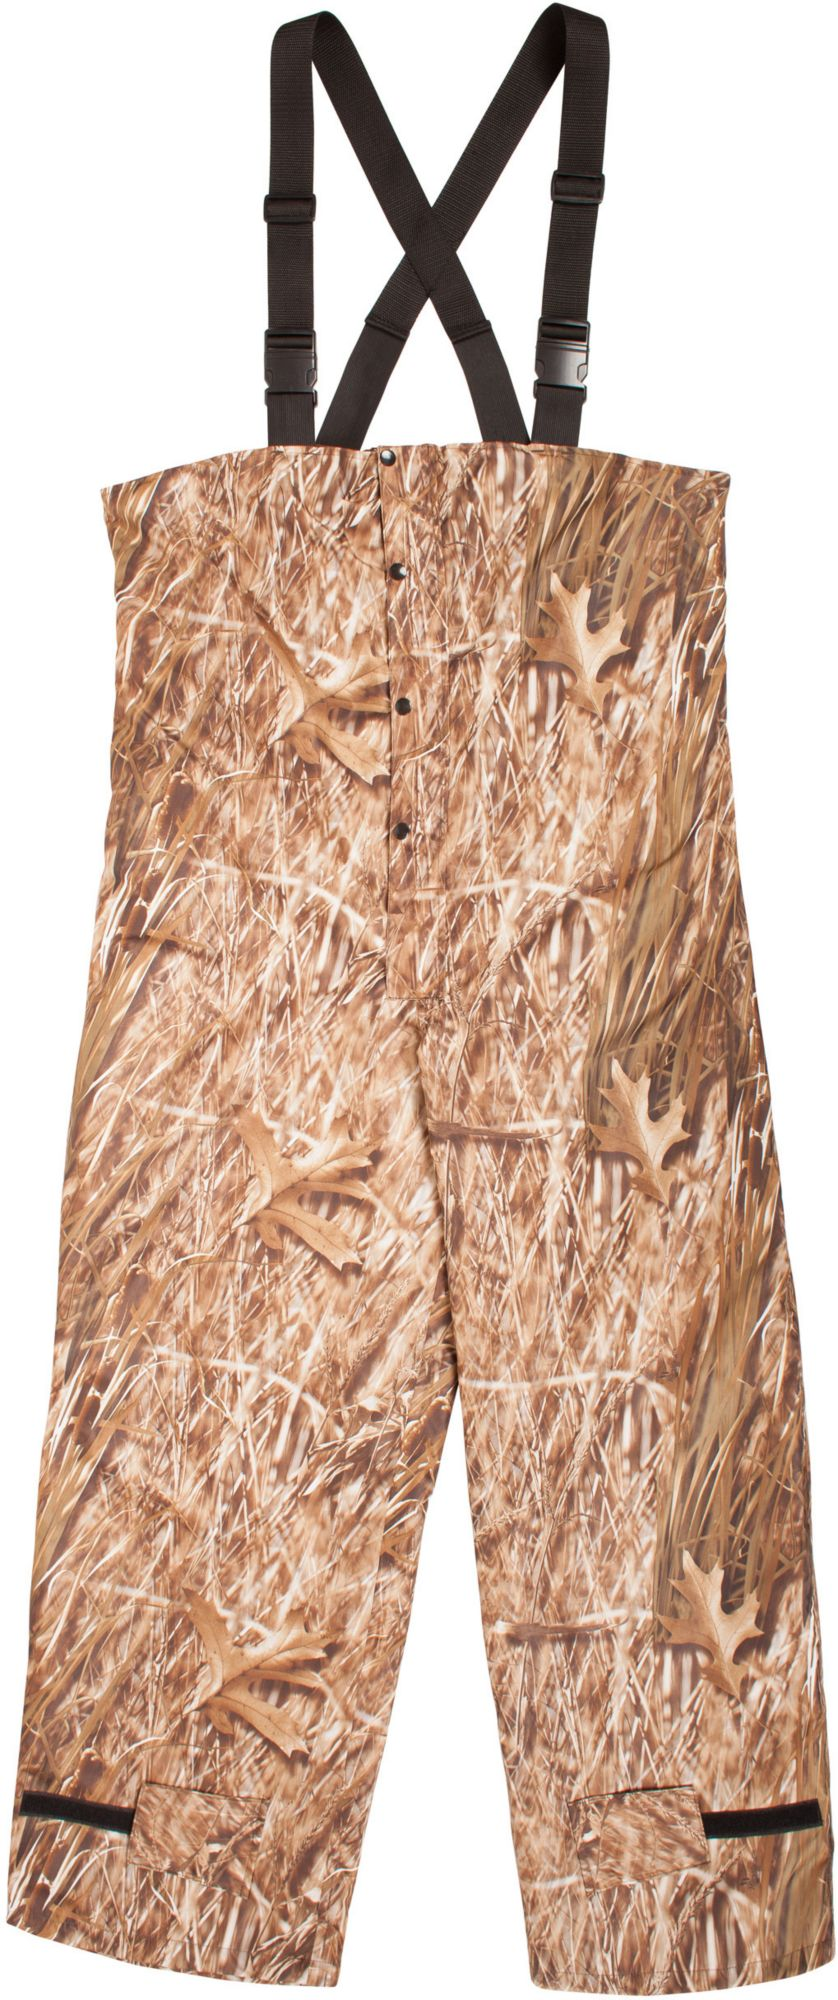 Huntworth Waterfowl WP Micro Bibs, Men's, Size: XL, Green thumbnail